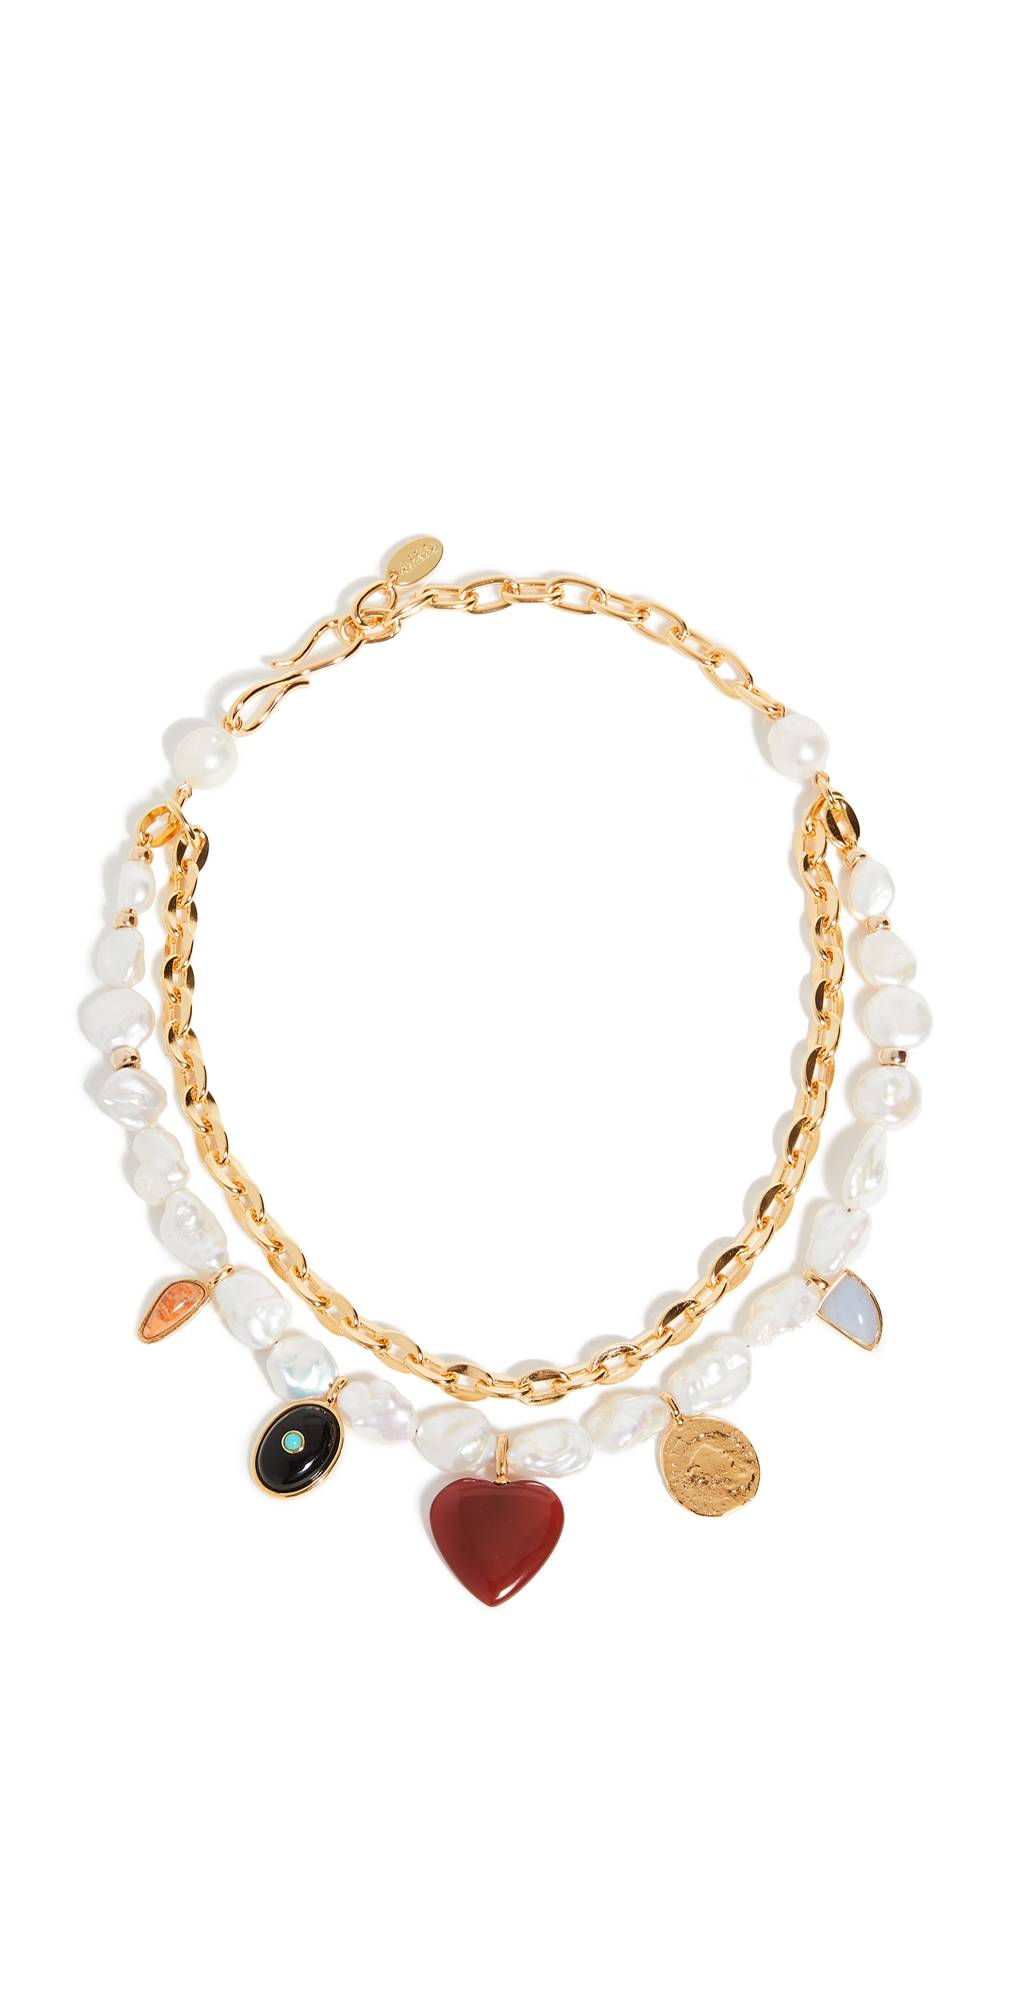 Lizzie Fortunato Tarot Garden Necklace  - Multi - Size: One Size